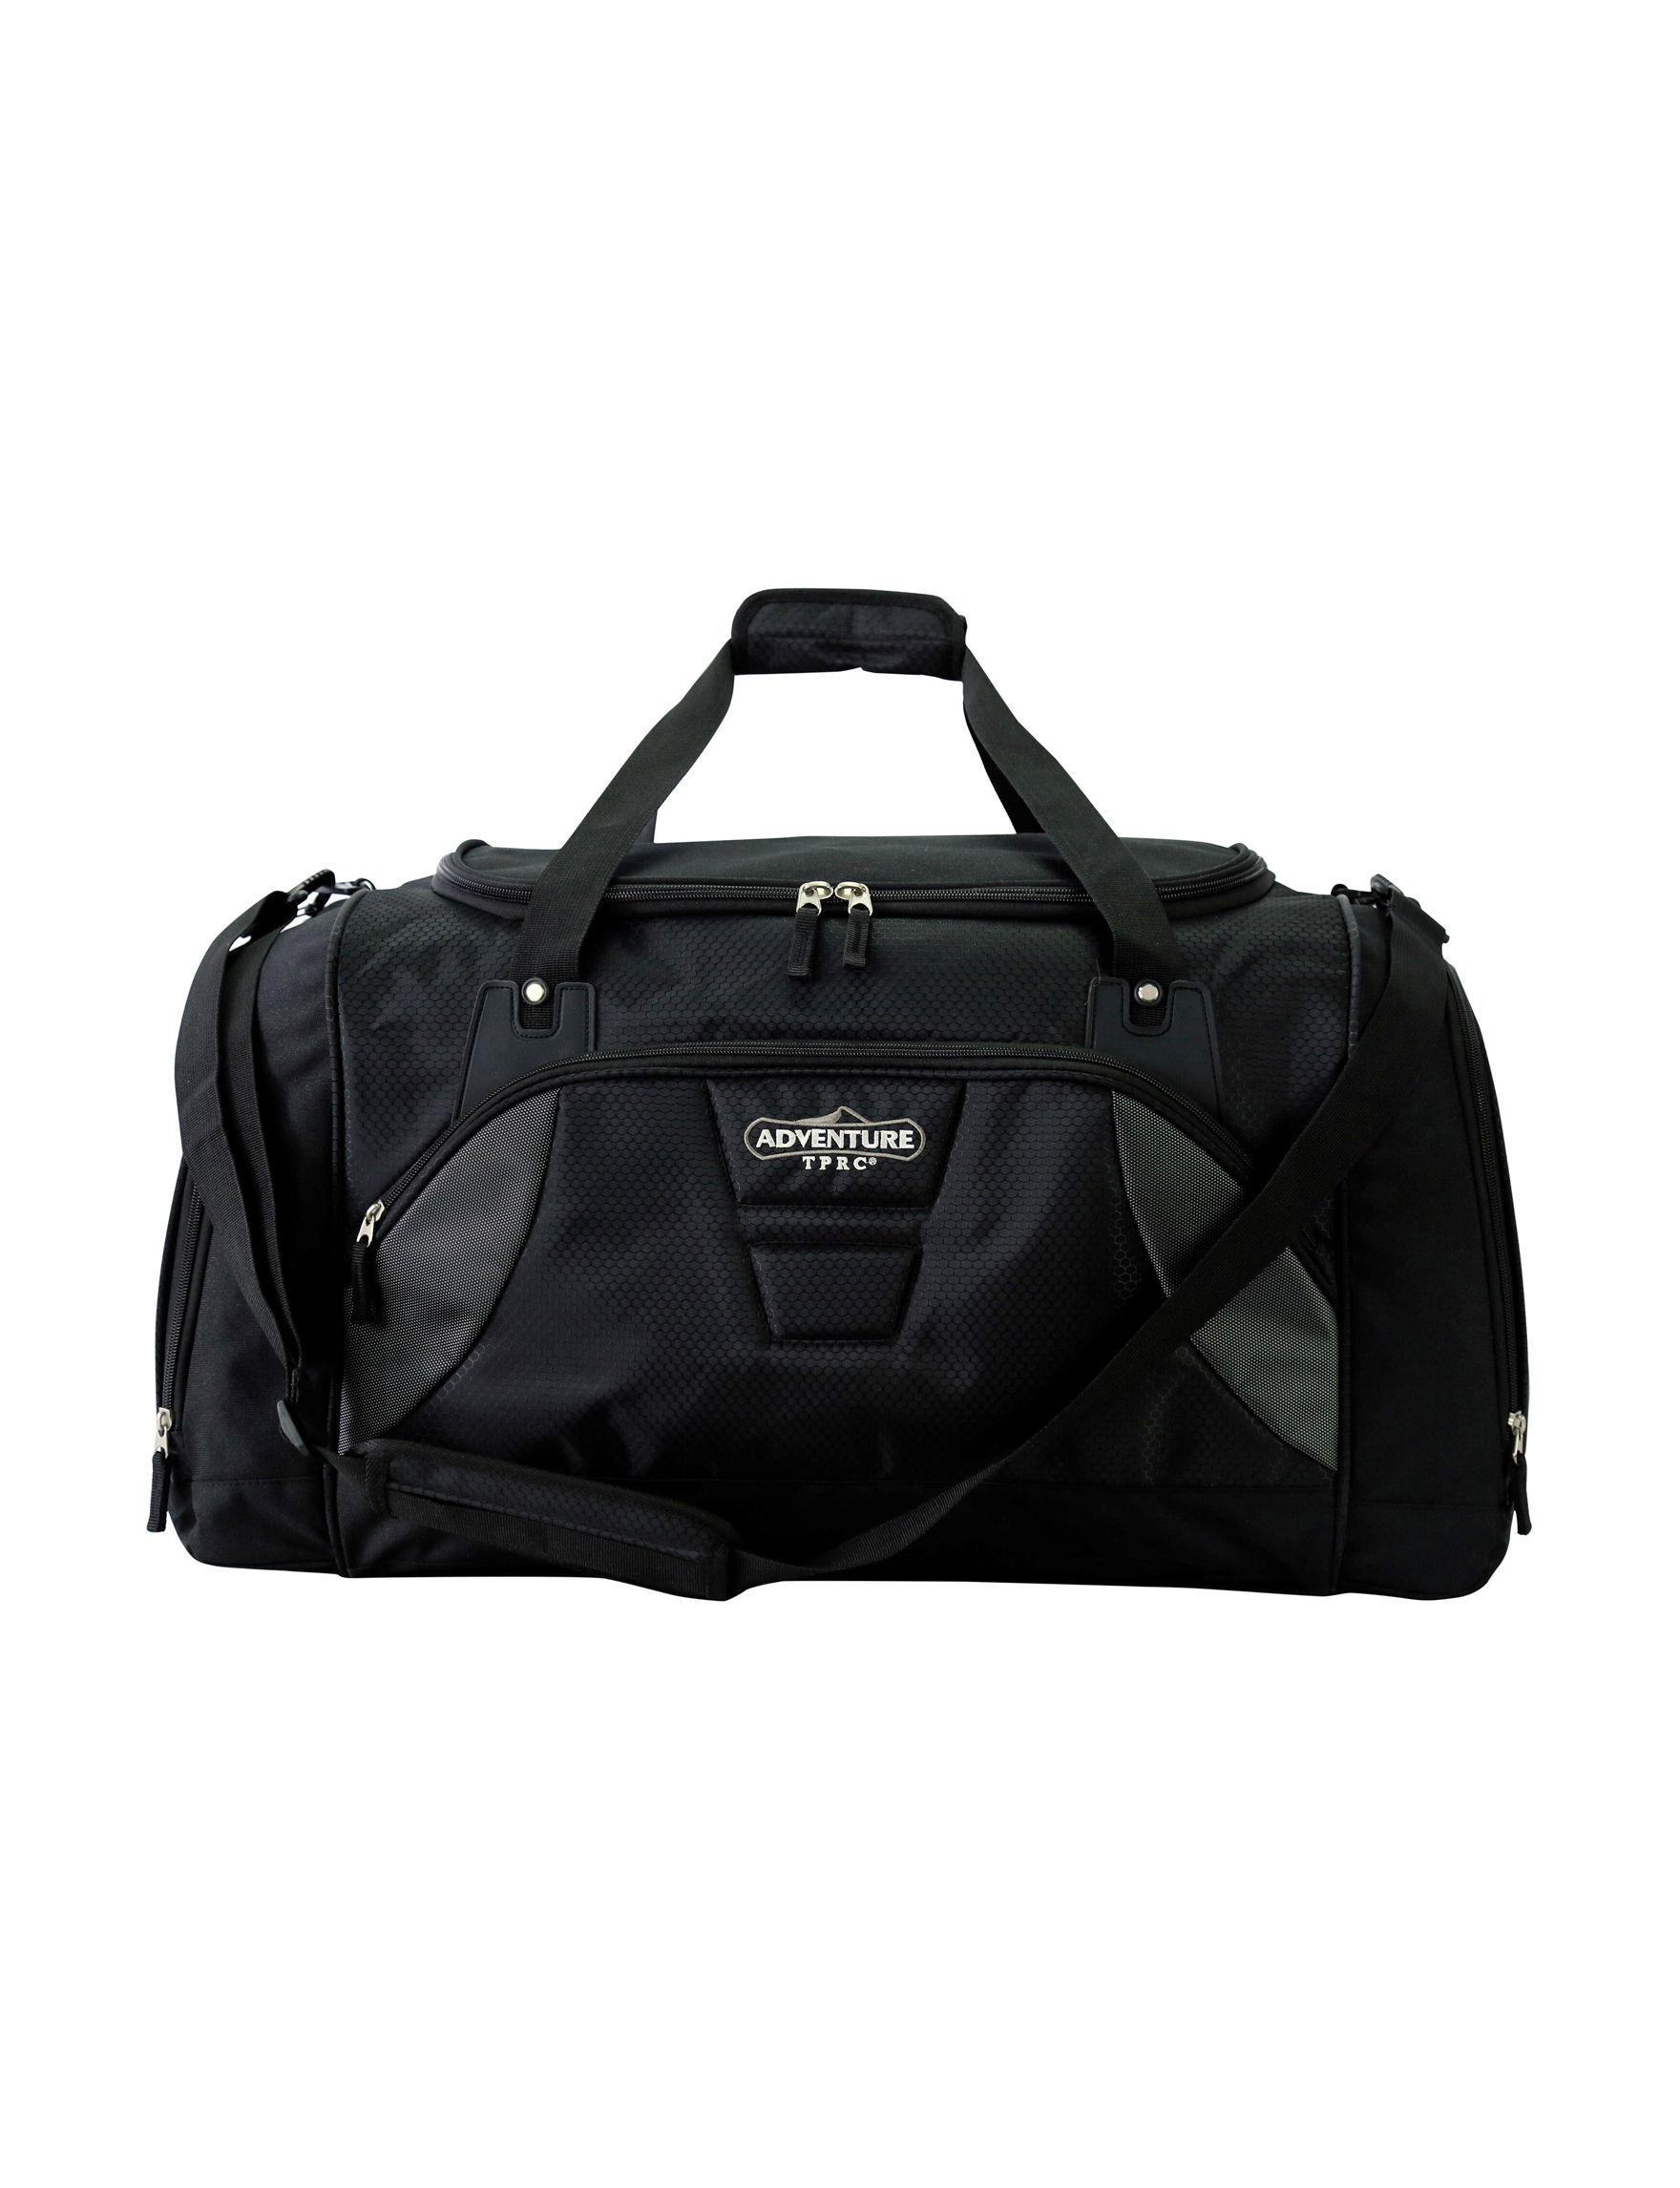 Travelers Club Luggage Black Duffle Bags